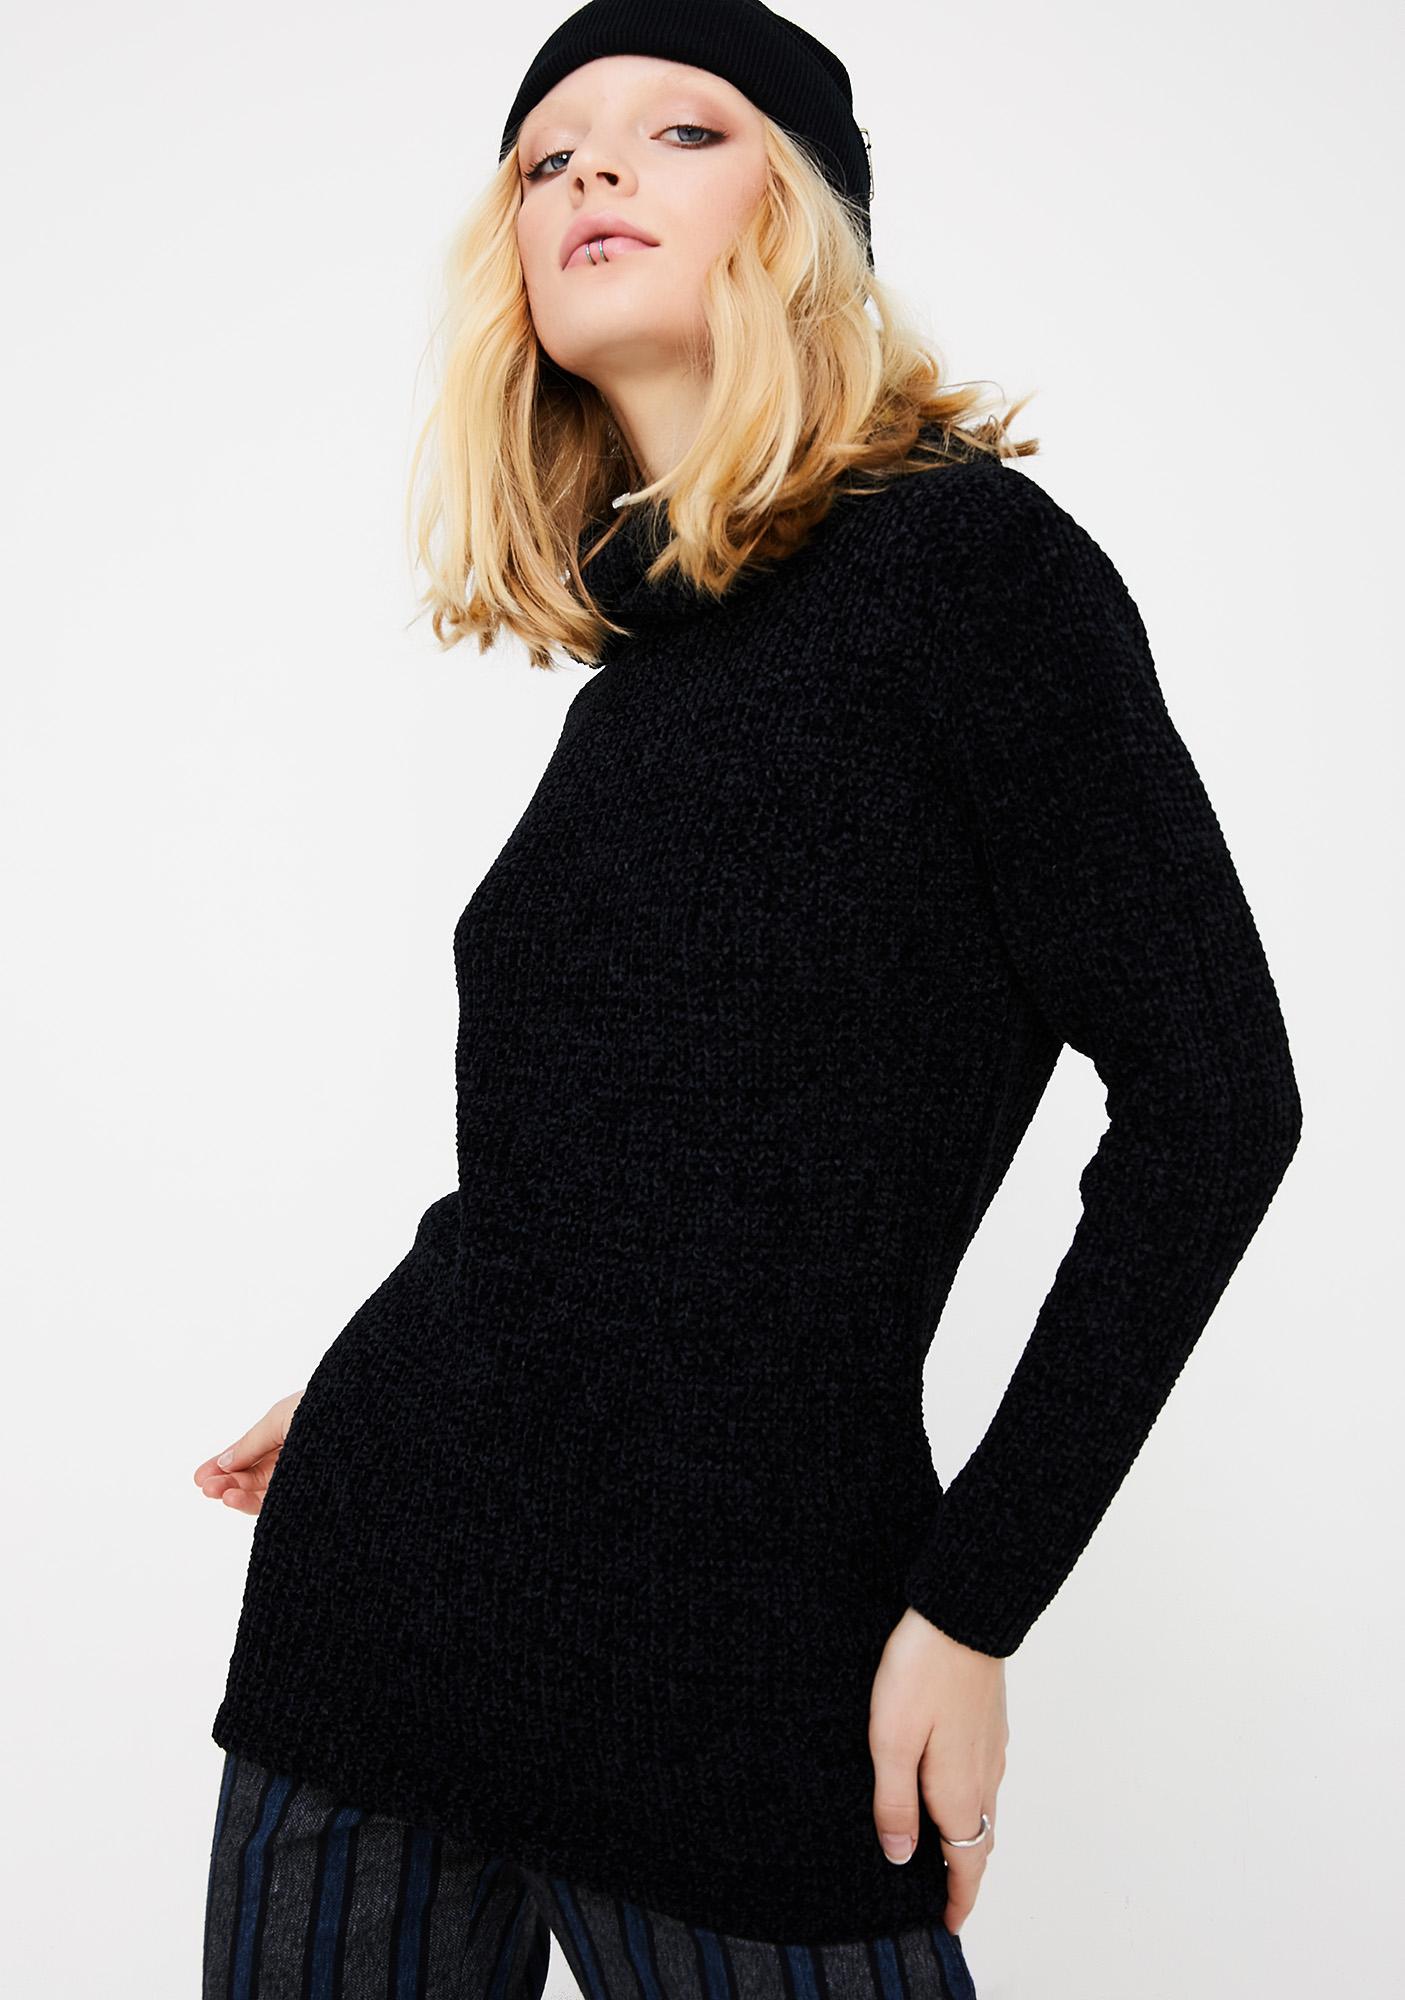 Forward Thinkin' Knit Sweater